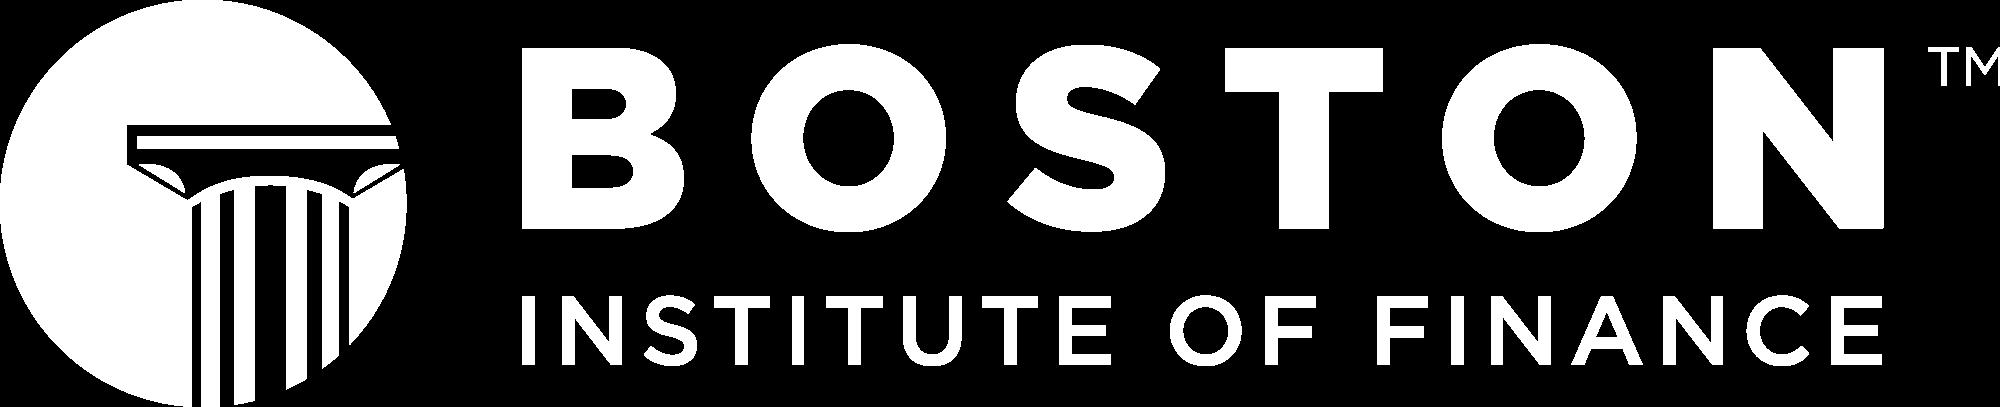 The Boston Institute of Finance